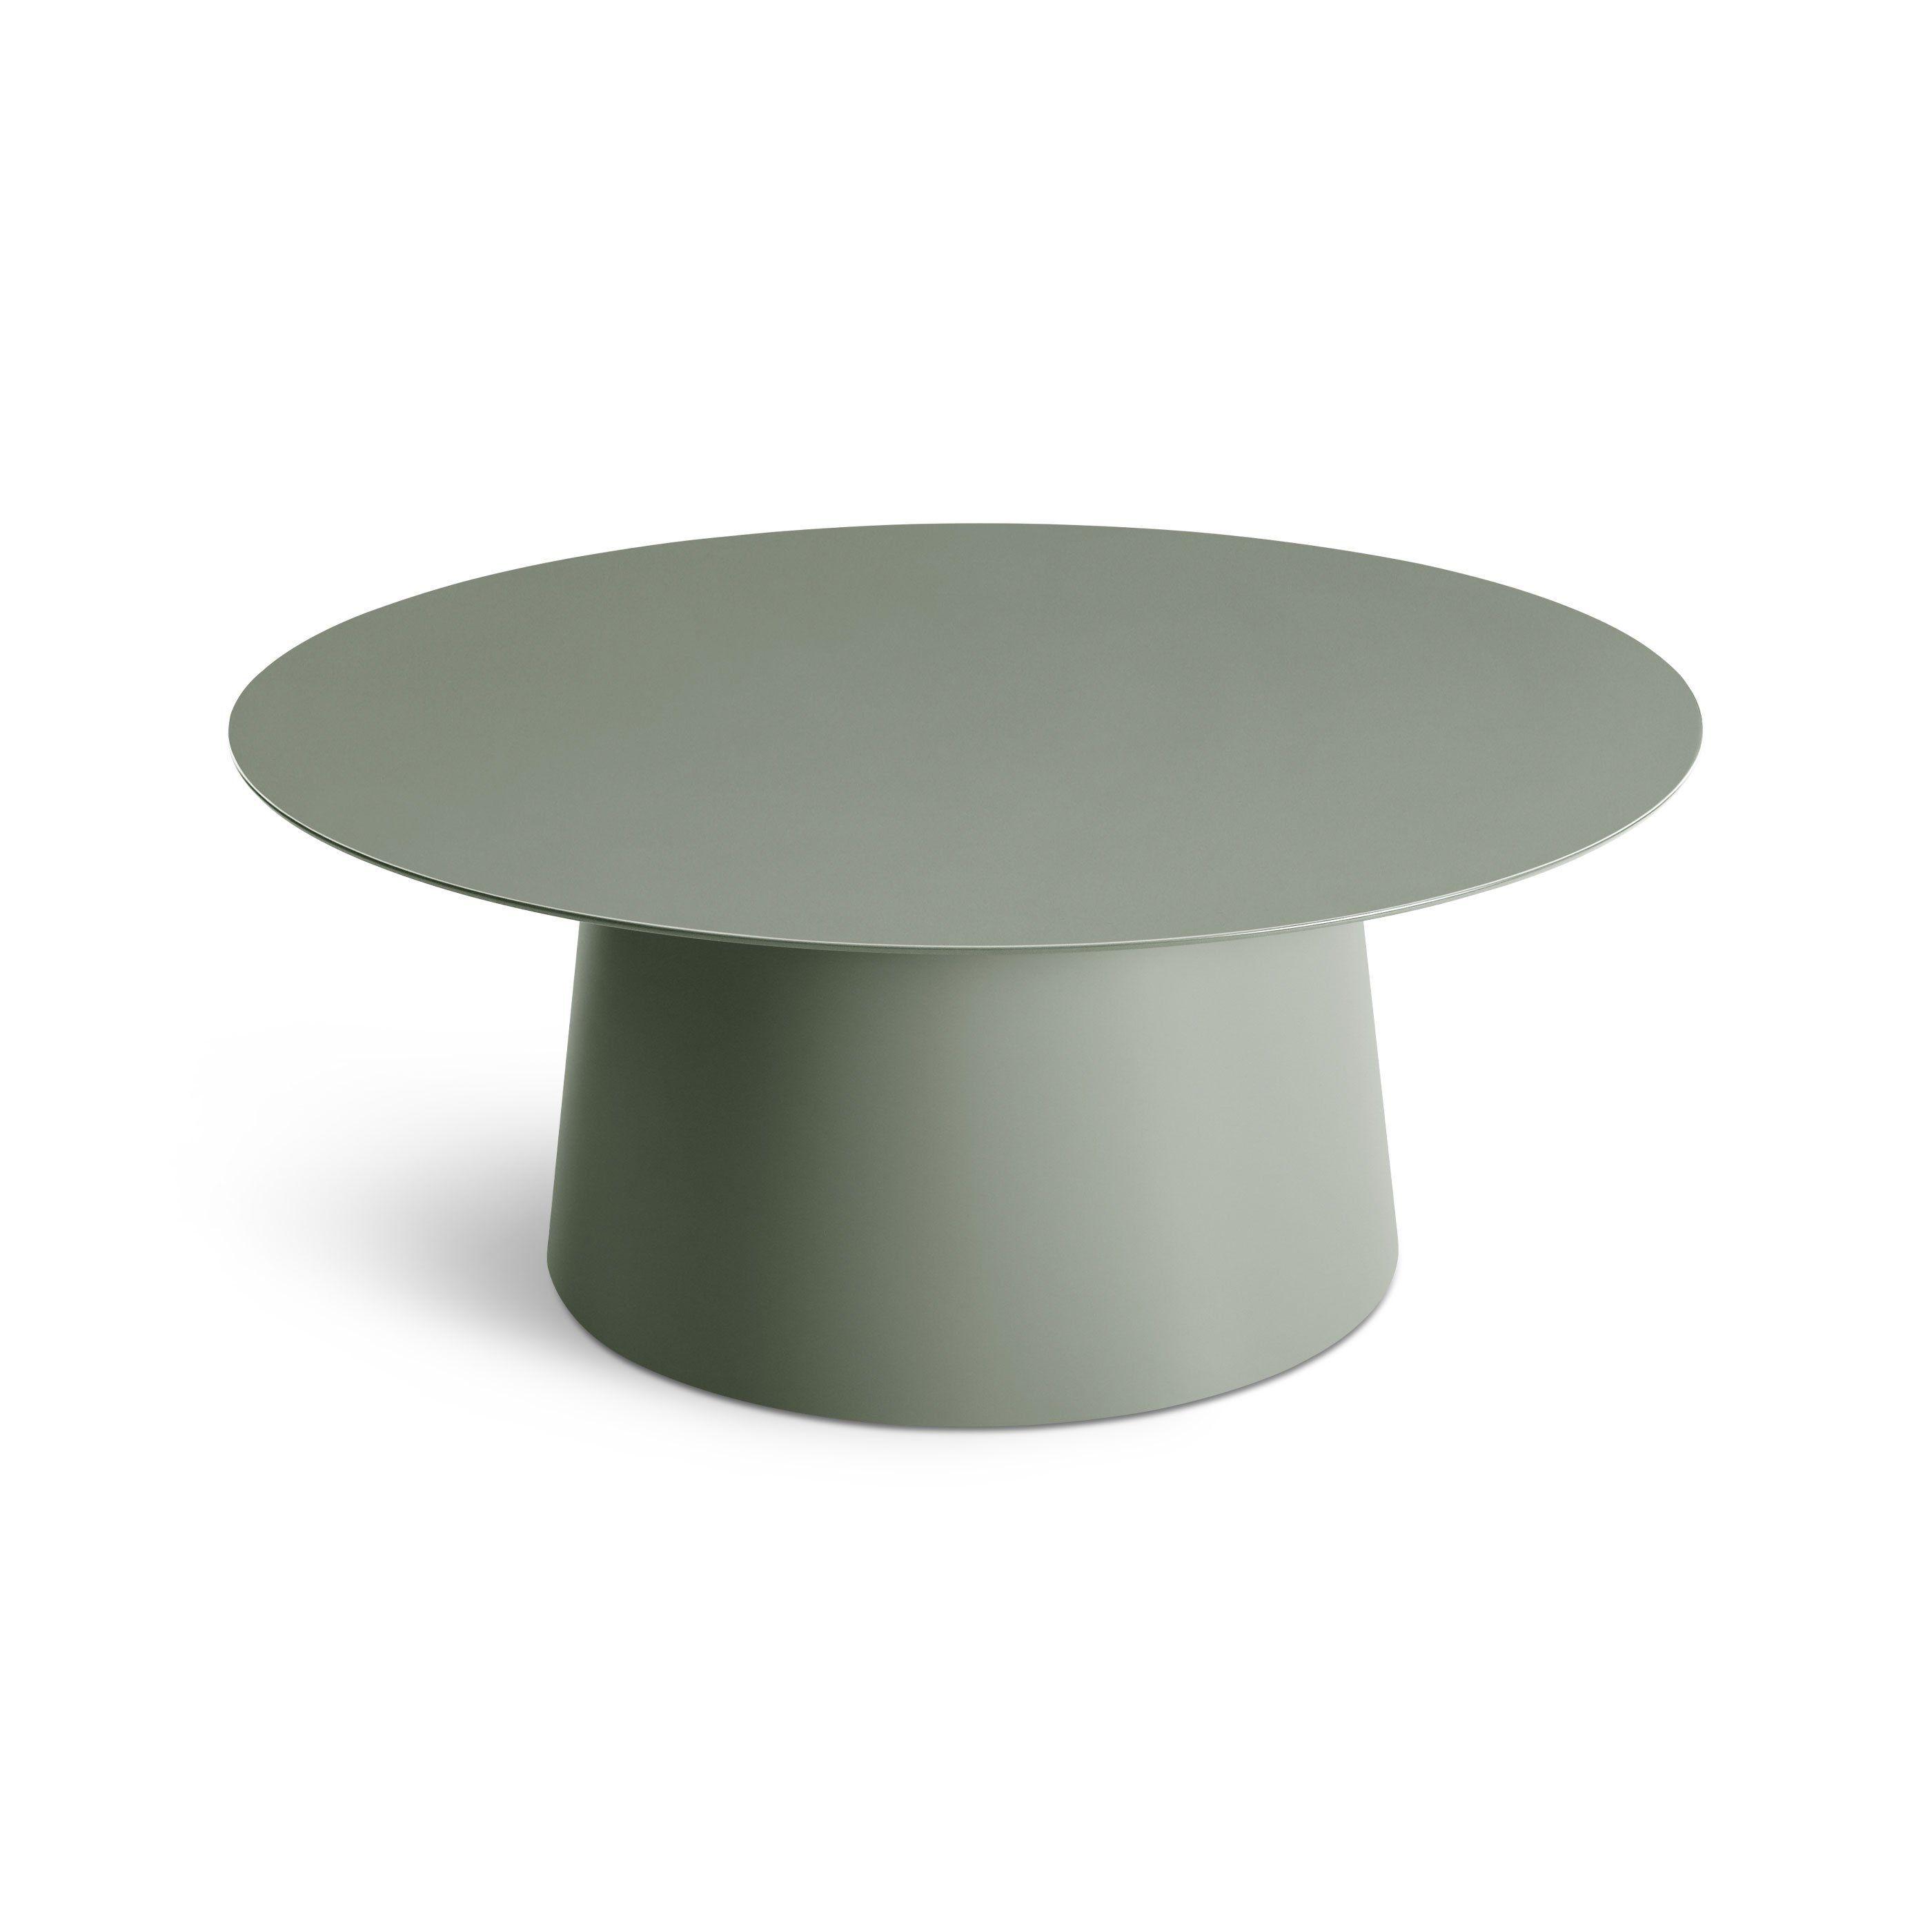 Circula Coffee Table Chic Coffee Table Round Coffee Table Modern Small Coffee Table [ 2800 x 2800 Pixel ]